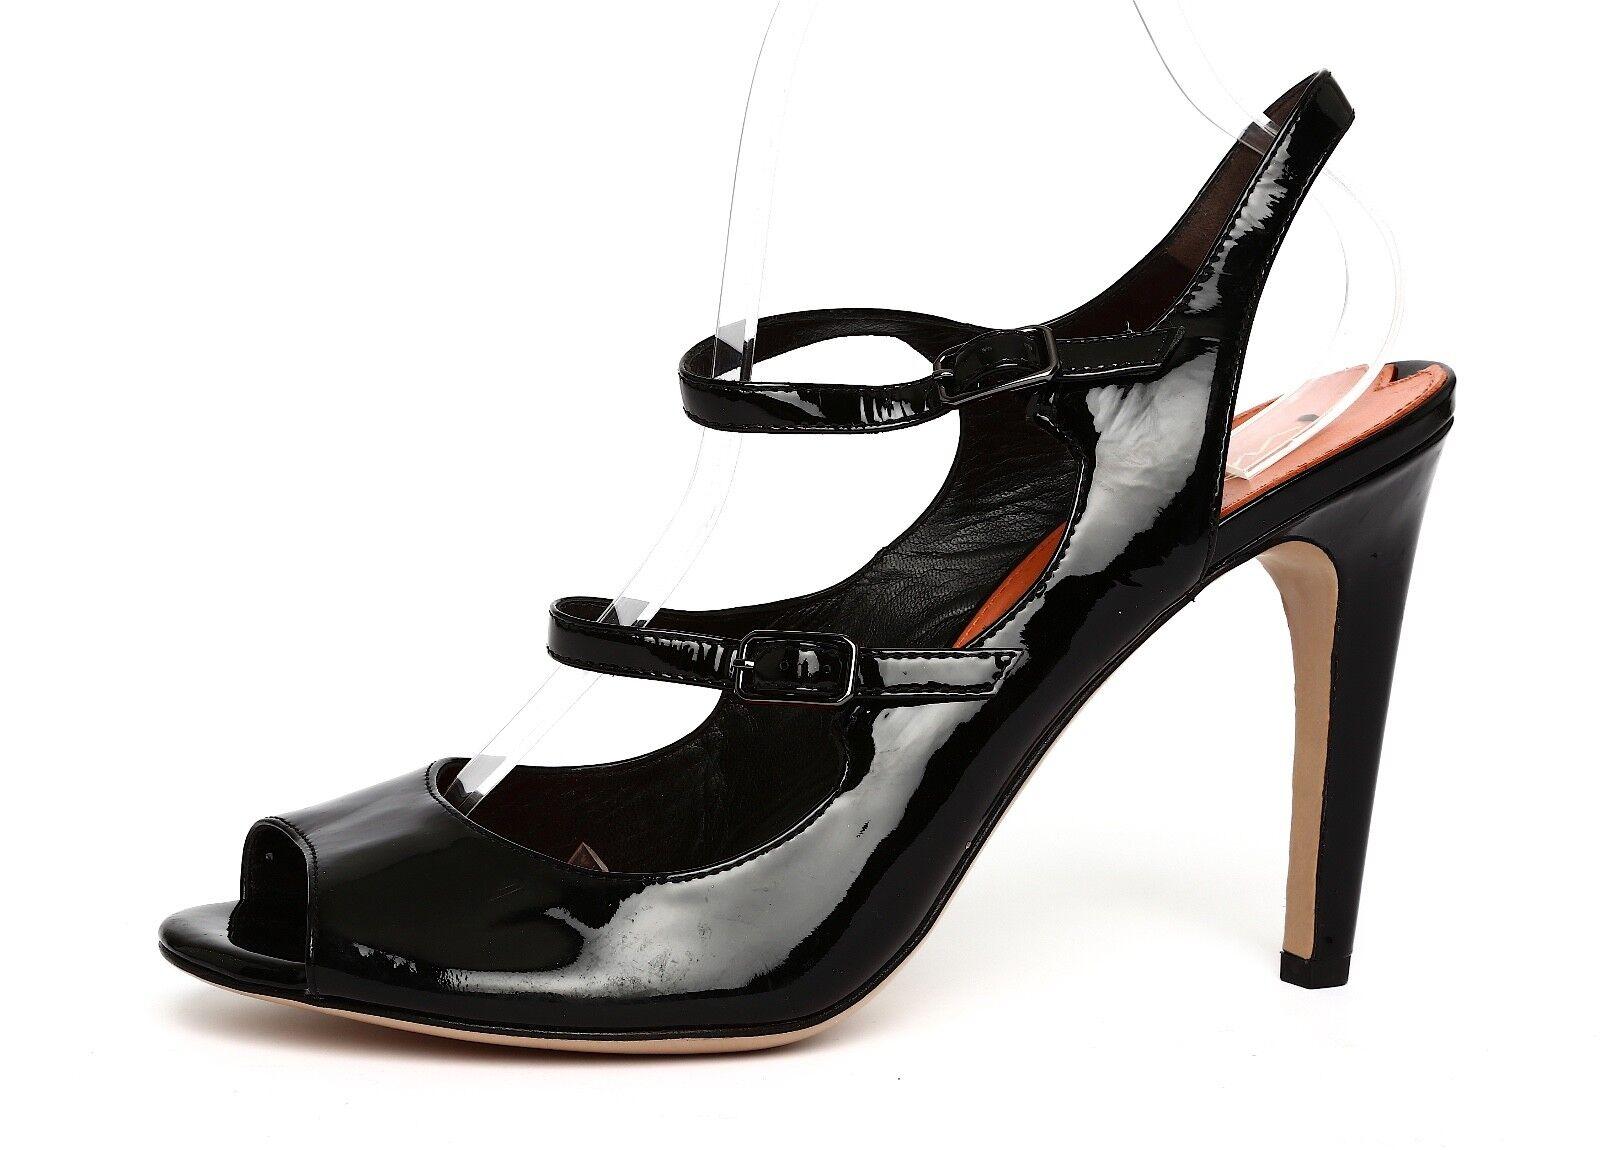 Via Spiga para mujeres Zapatos De Taco Alto Charol Sandalias Sandalias Sandalias Negro talla 9 M 3393  precioso